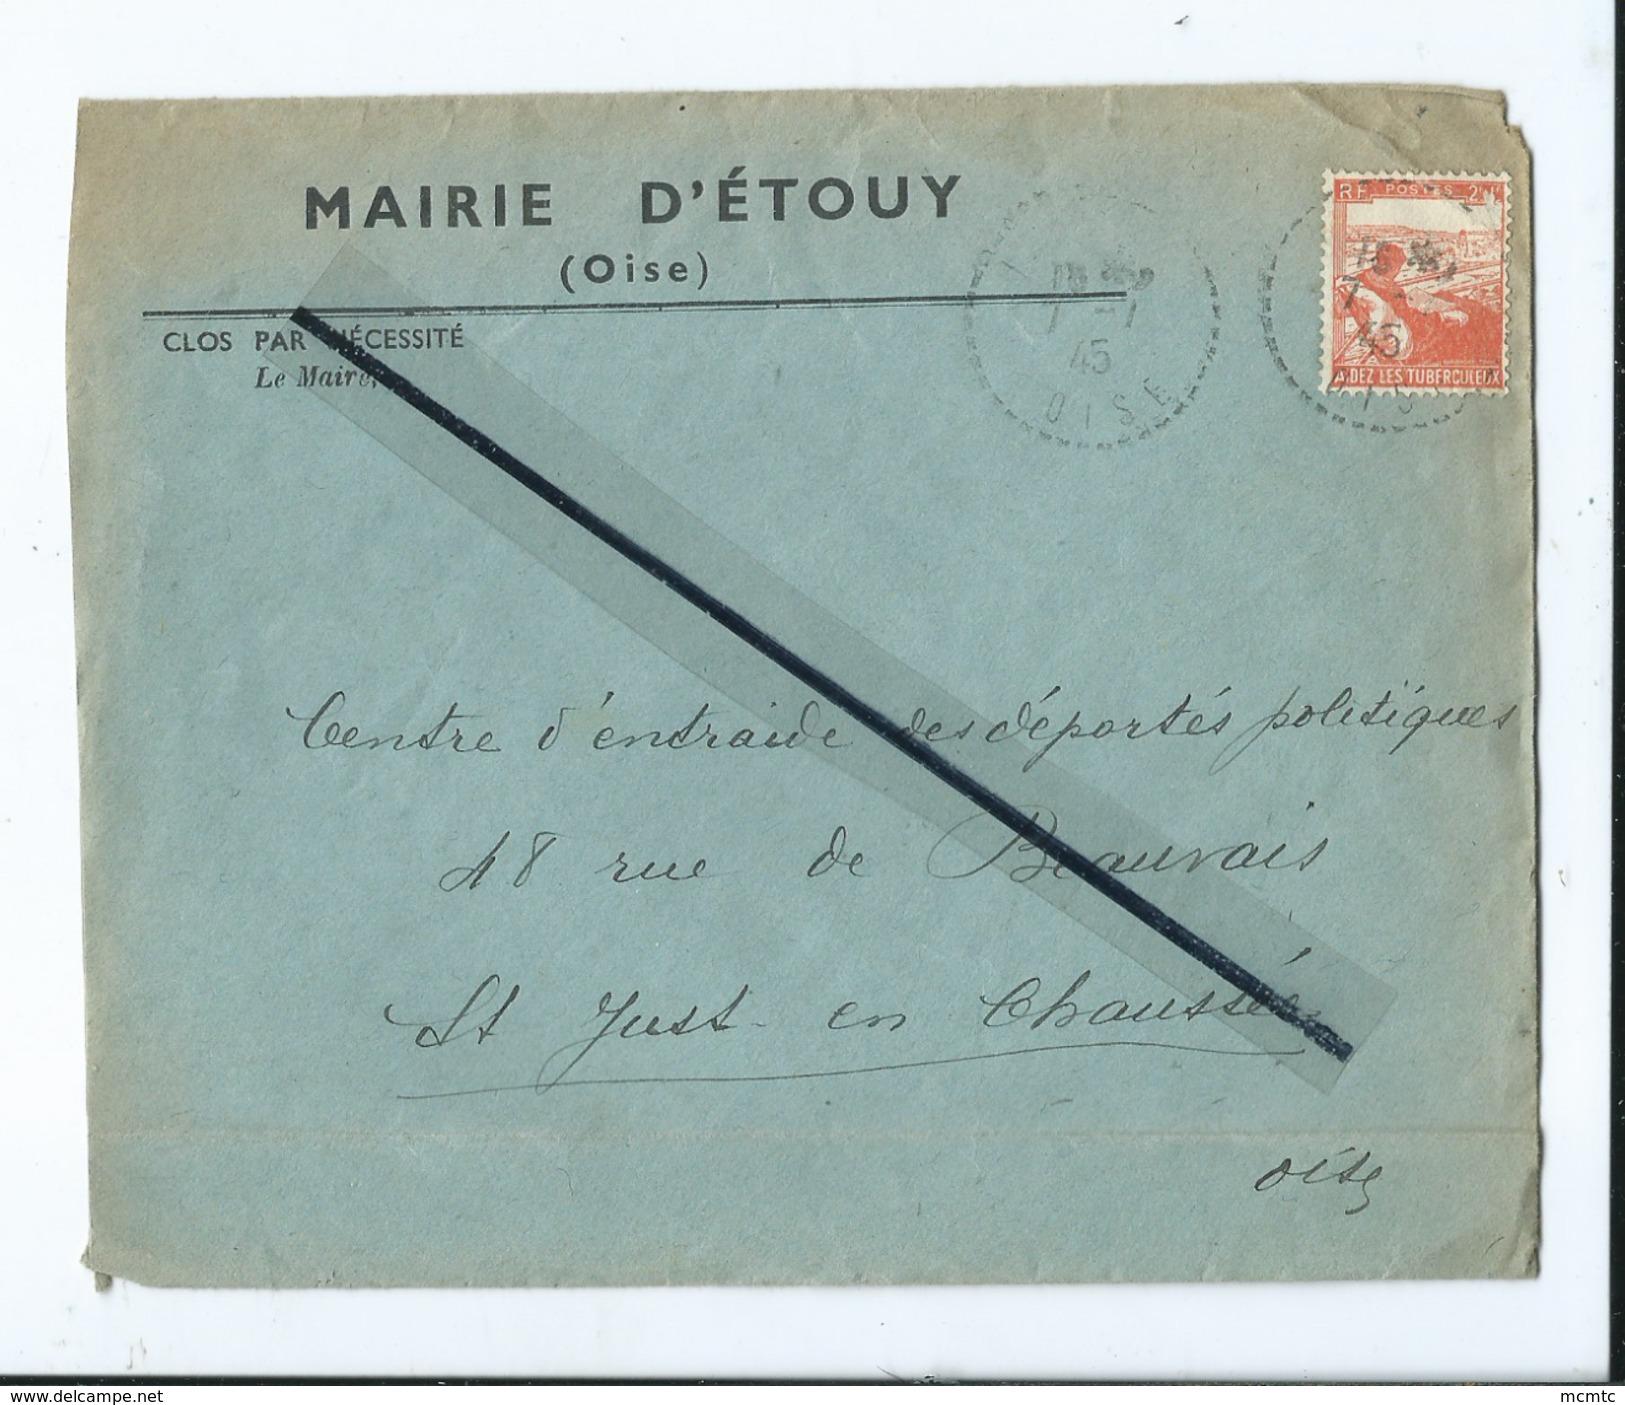 Enveloppe Ancienne De 1945 Timbrée - Mairie D'Etouy  -(Oise ) - 1921-1960: Modern Tijdperk